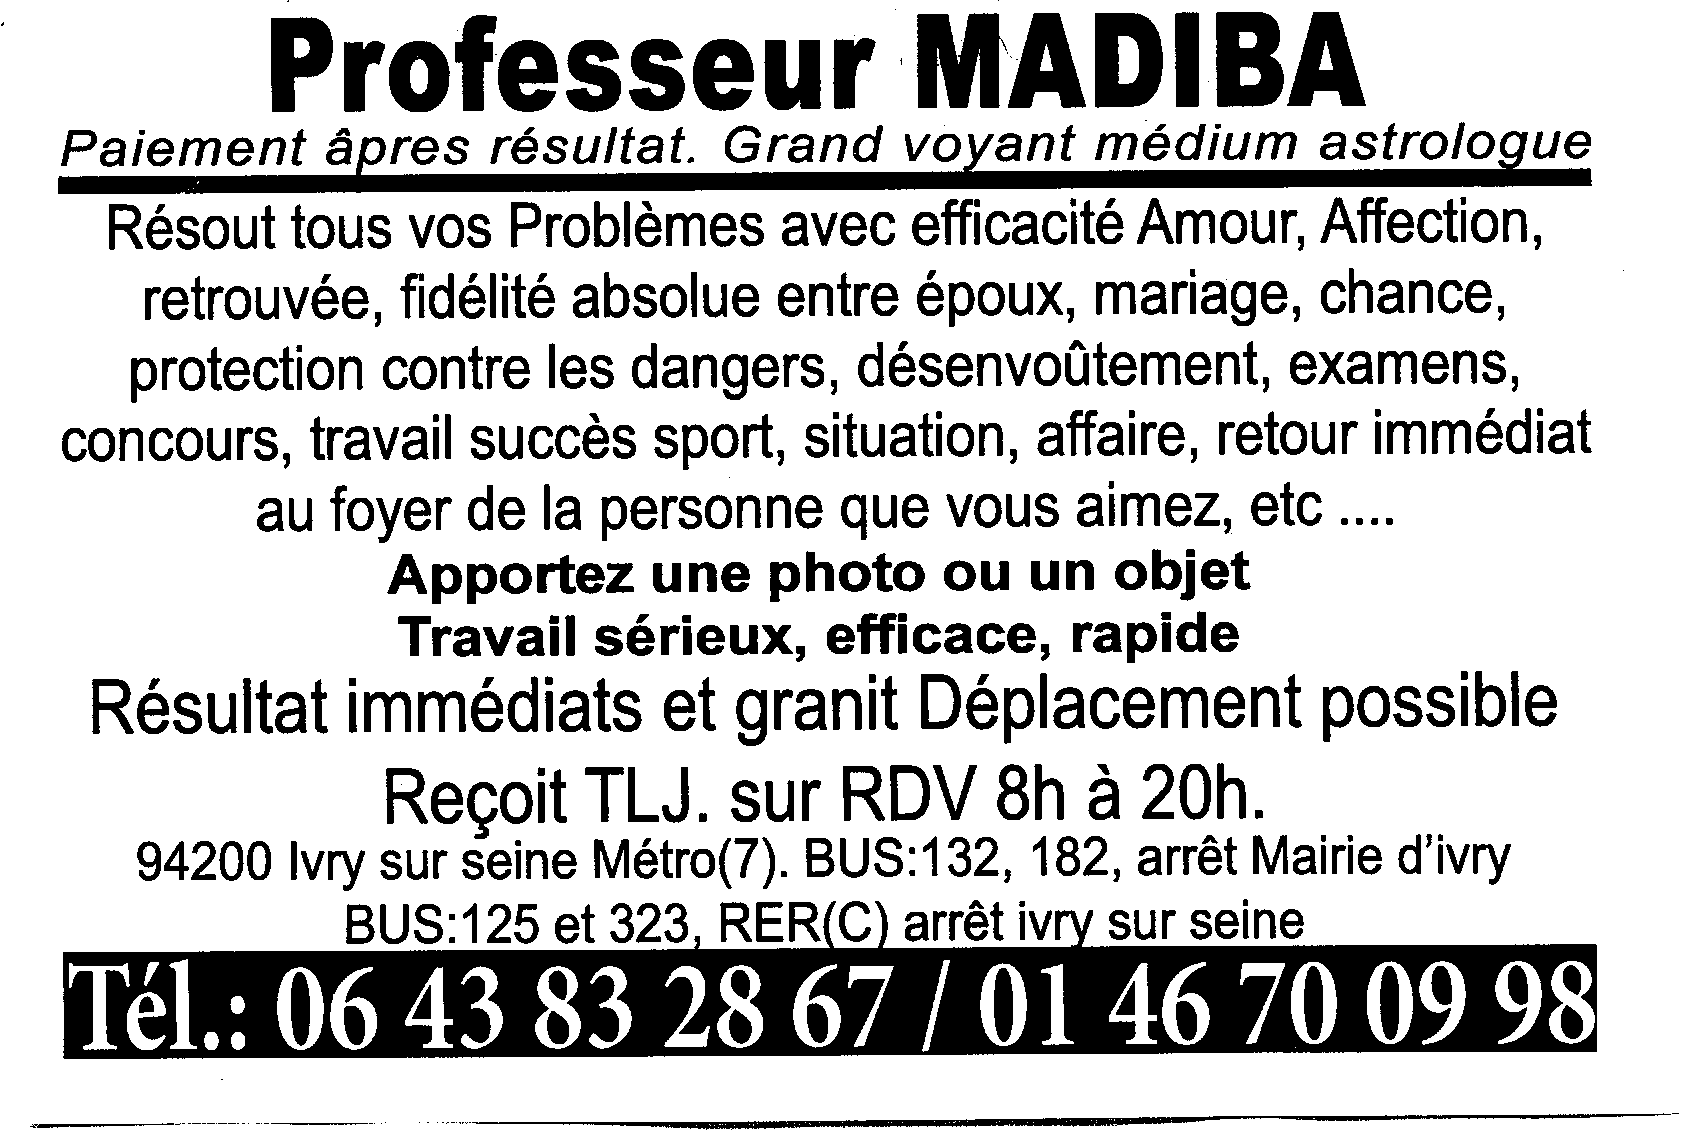 Prof Madiba